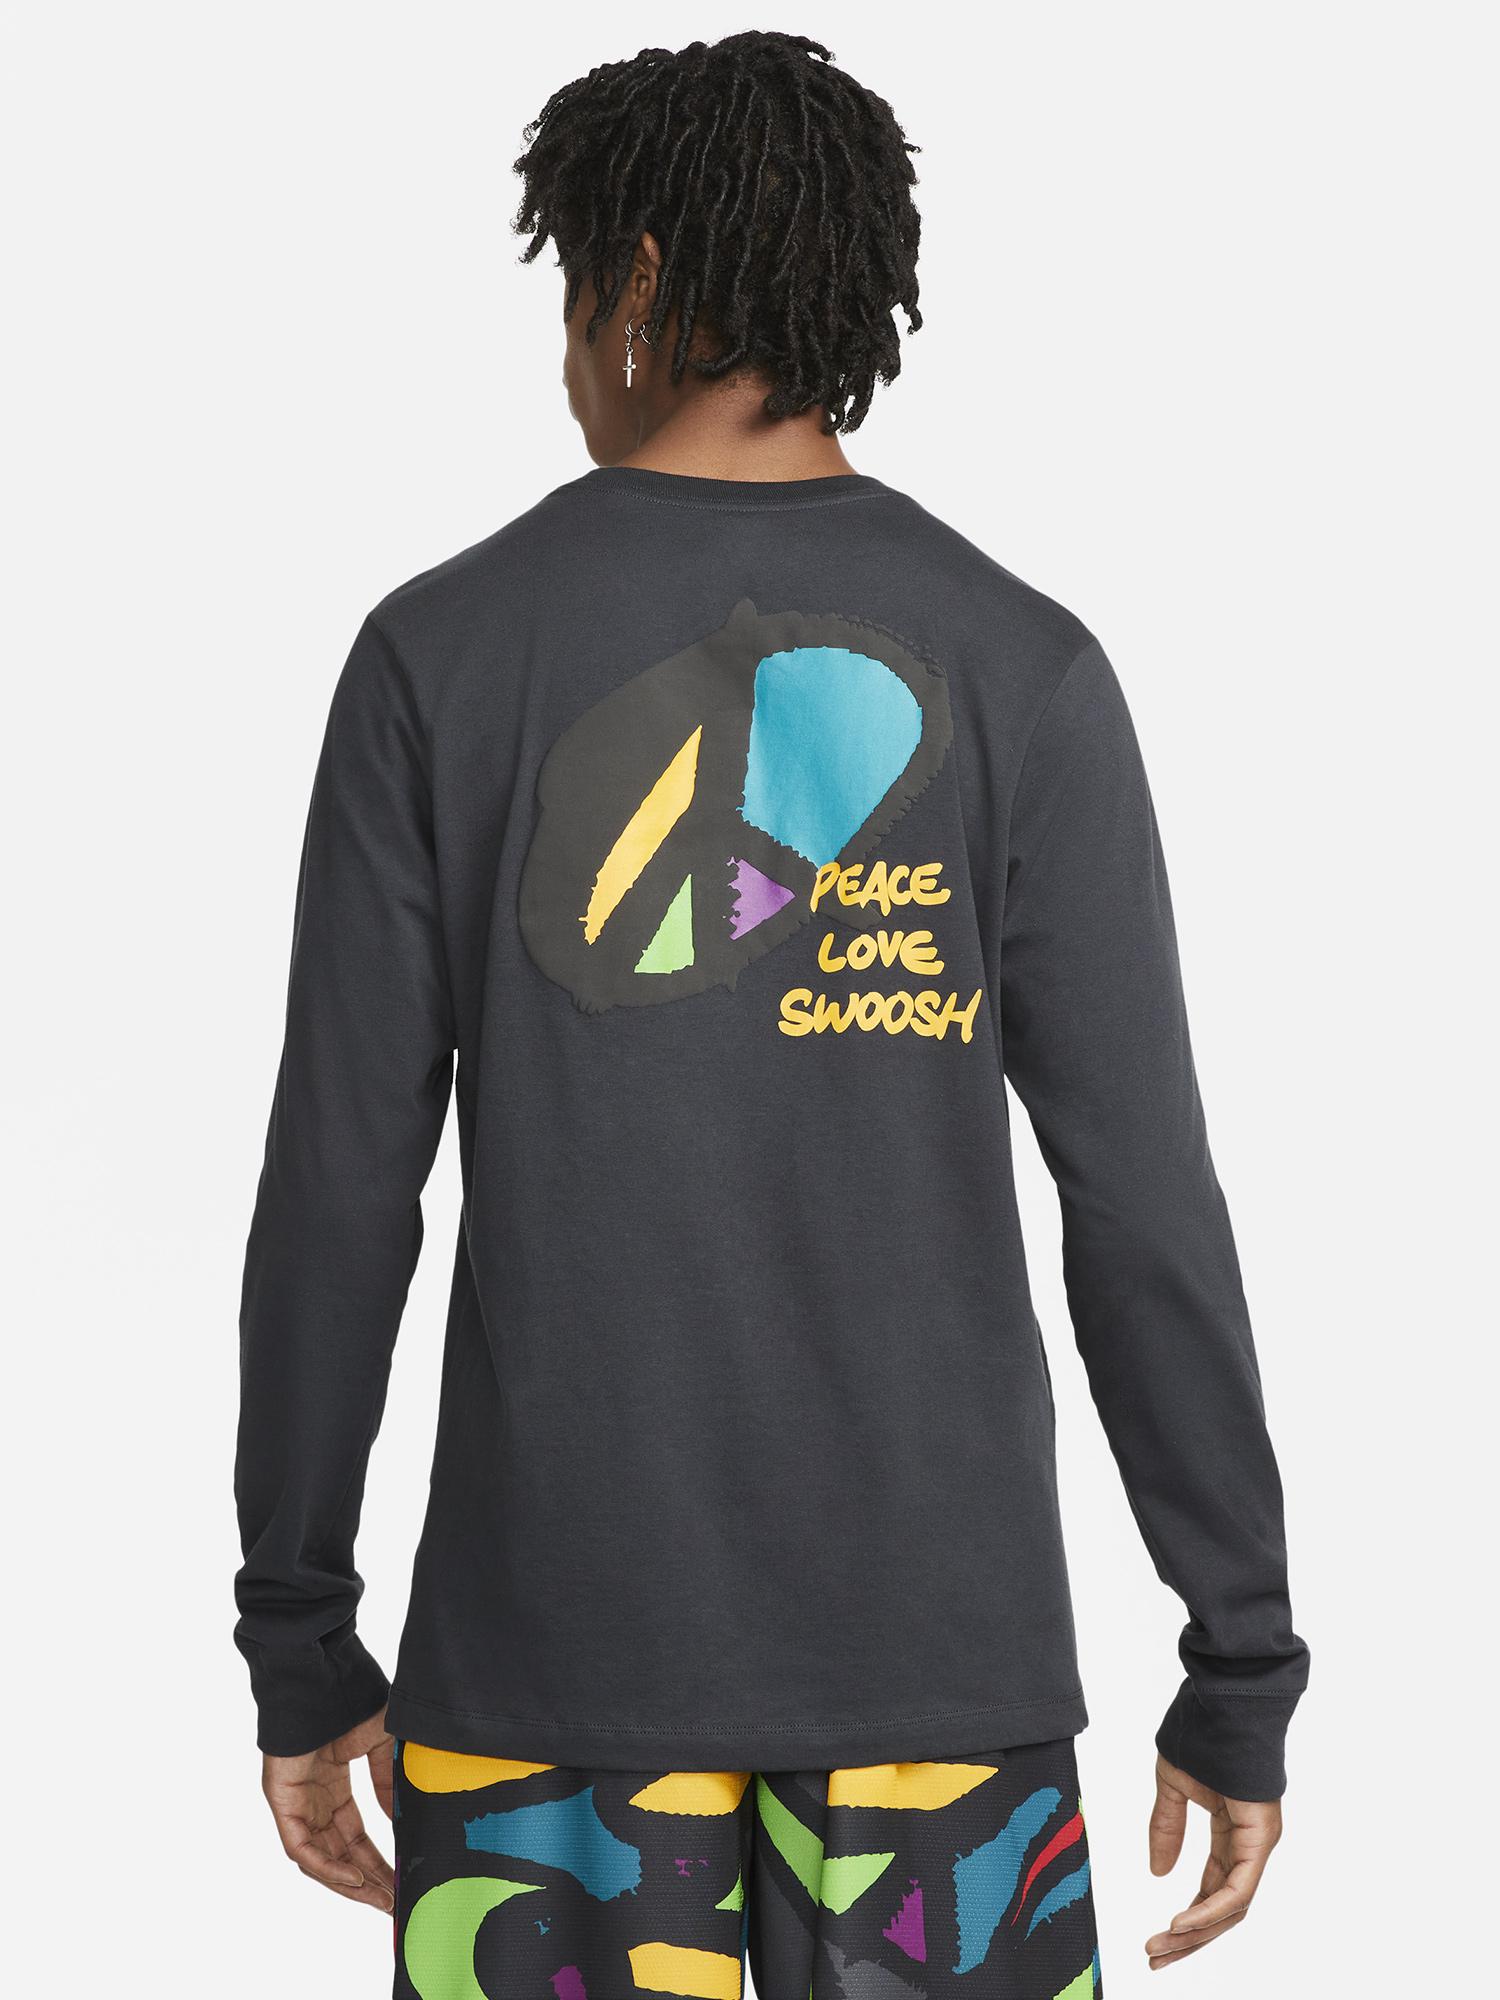 nike-peace-love-swoosh-long-sleeve-shirt-2